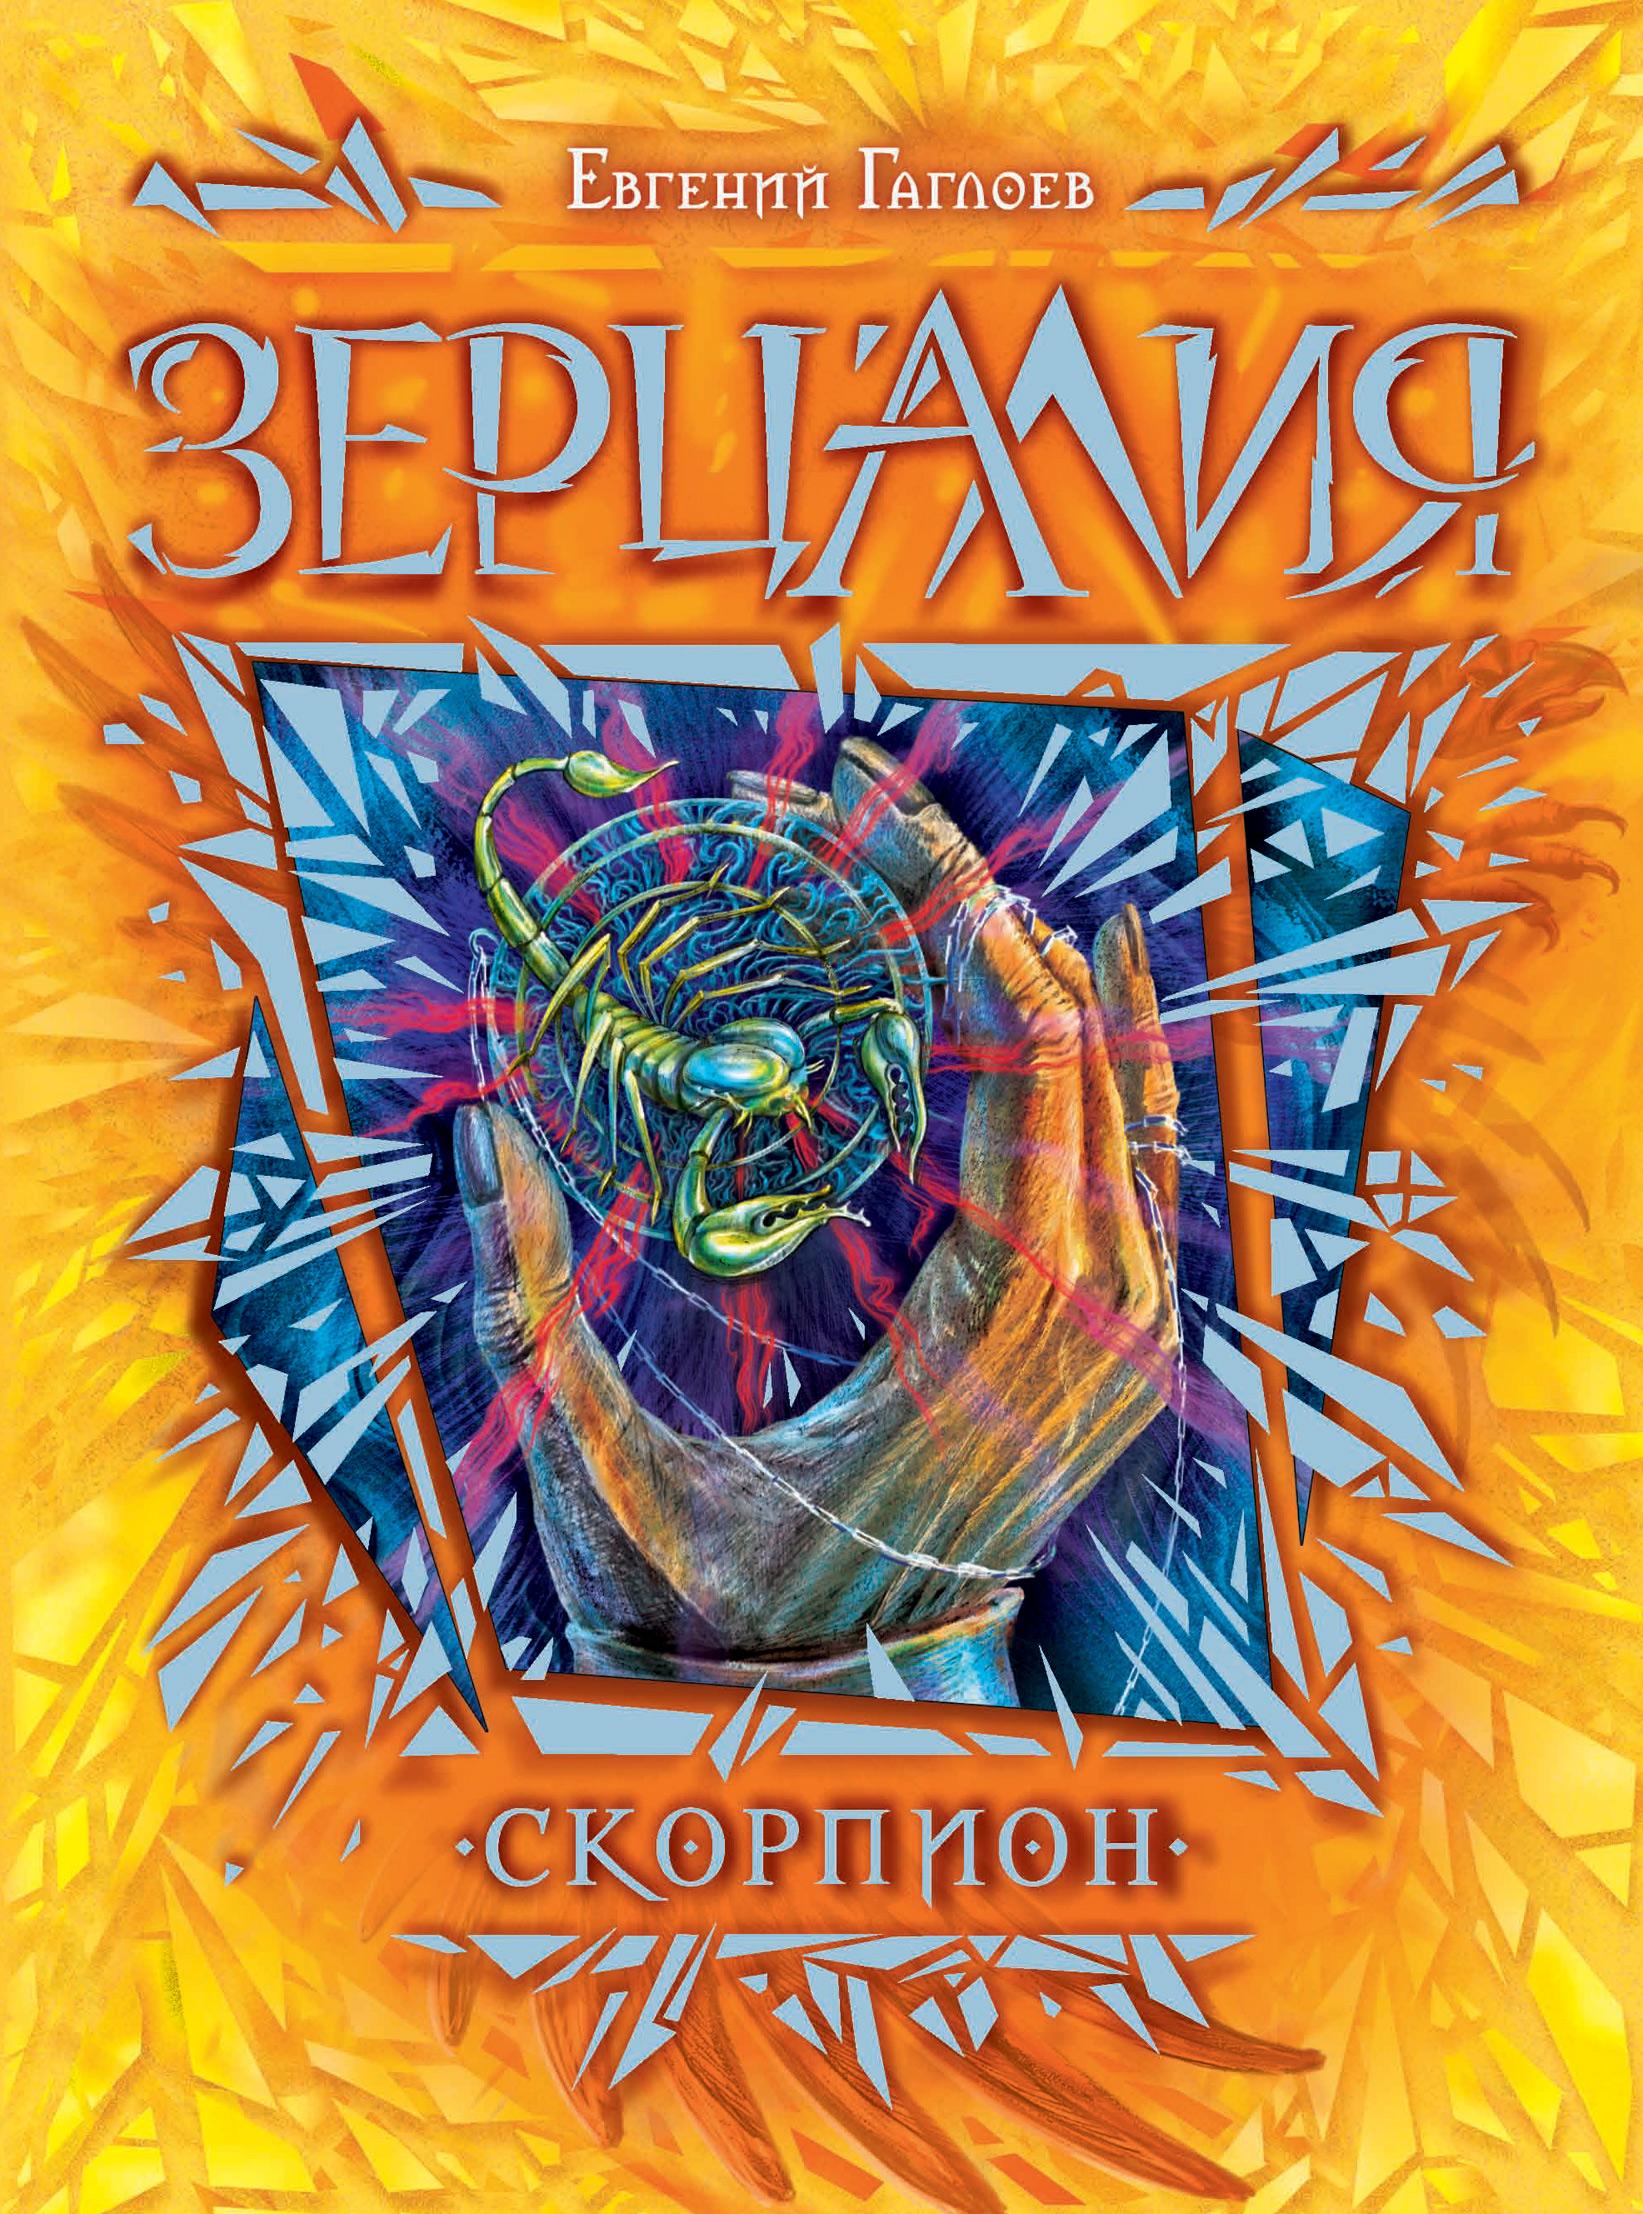 Евгений Гаглоев Скорпион гаглоев евгений зерцалия книга 4 тетрагон